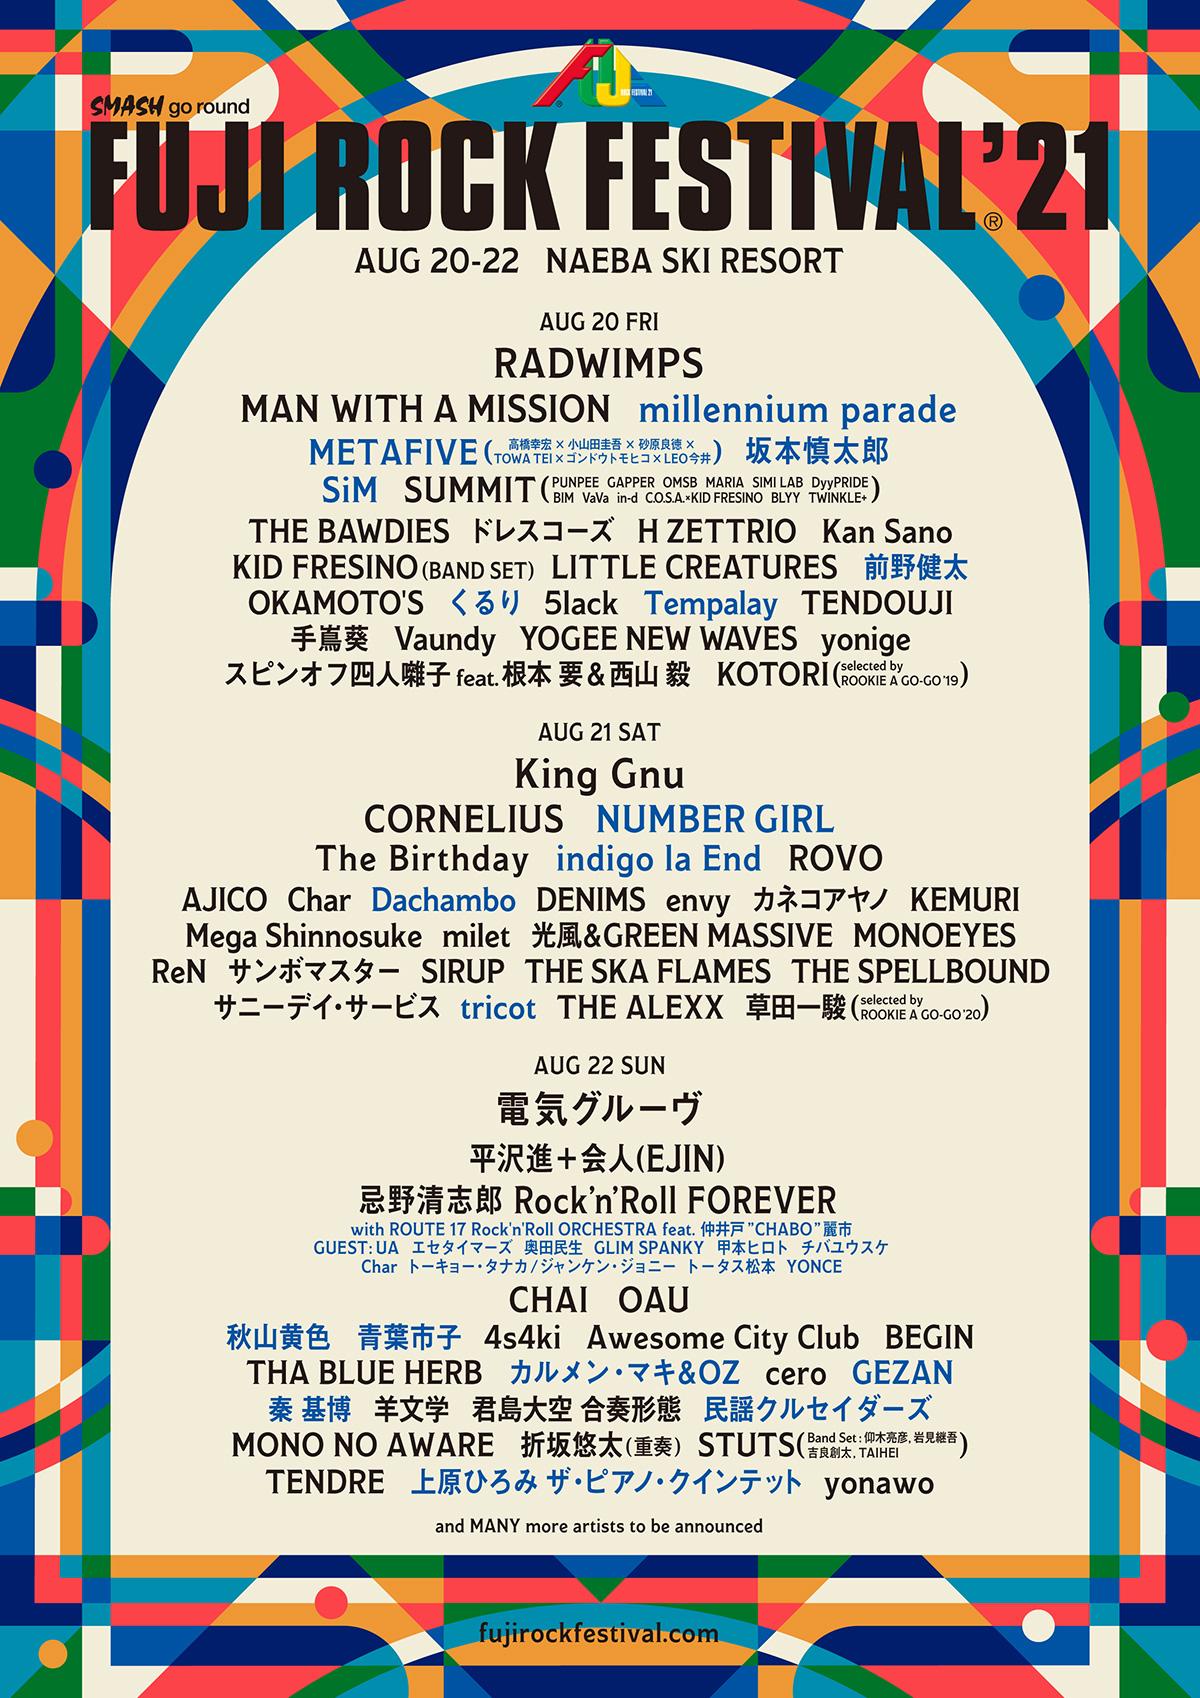 https://cdn.fujirockfestival.com/smash/top/ZSWzFNu9KMrrsaKFefIt3oW4gB4hUGLe8cHQ4HF5.jpeg